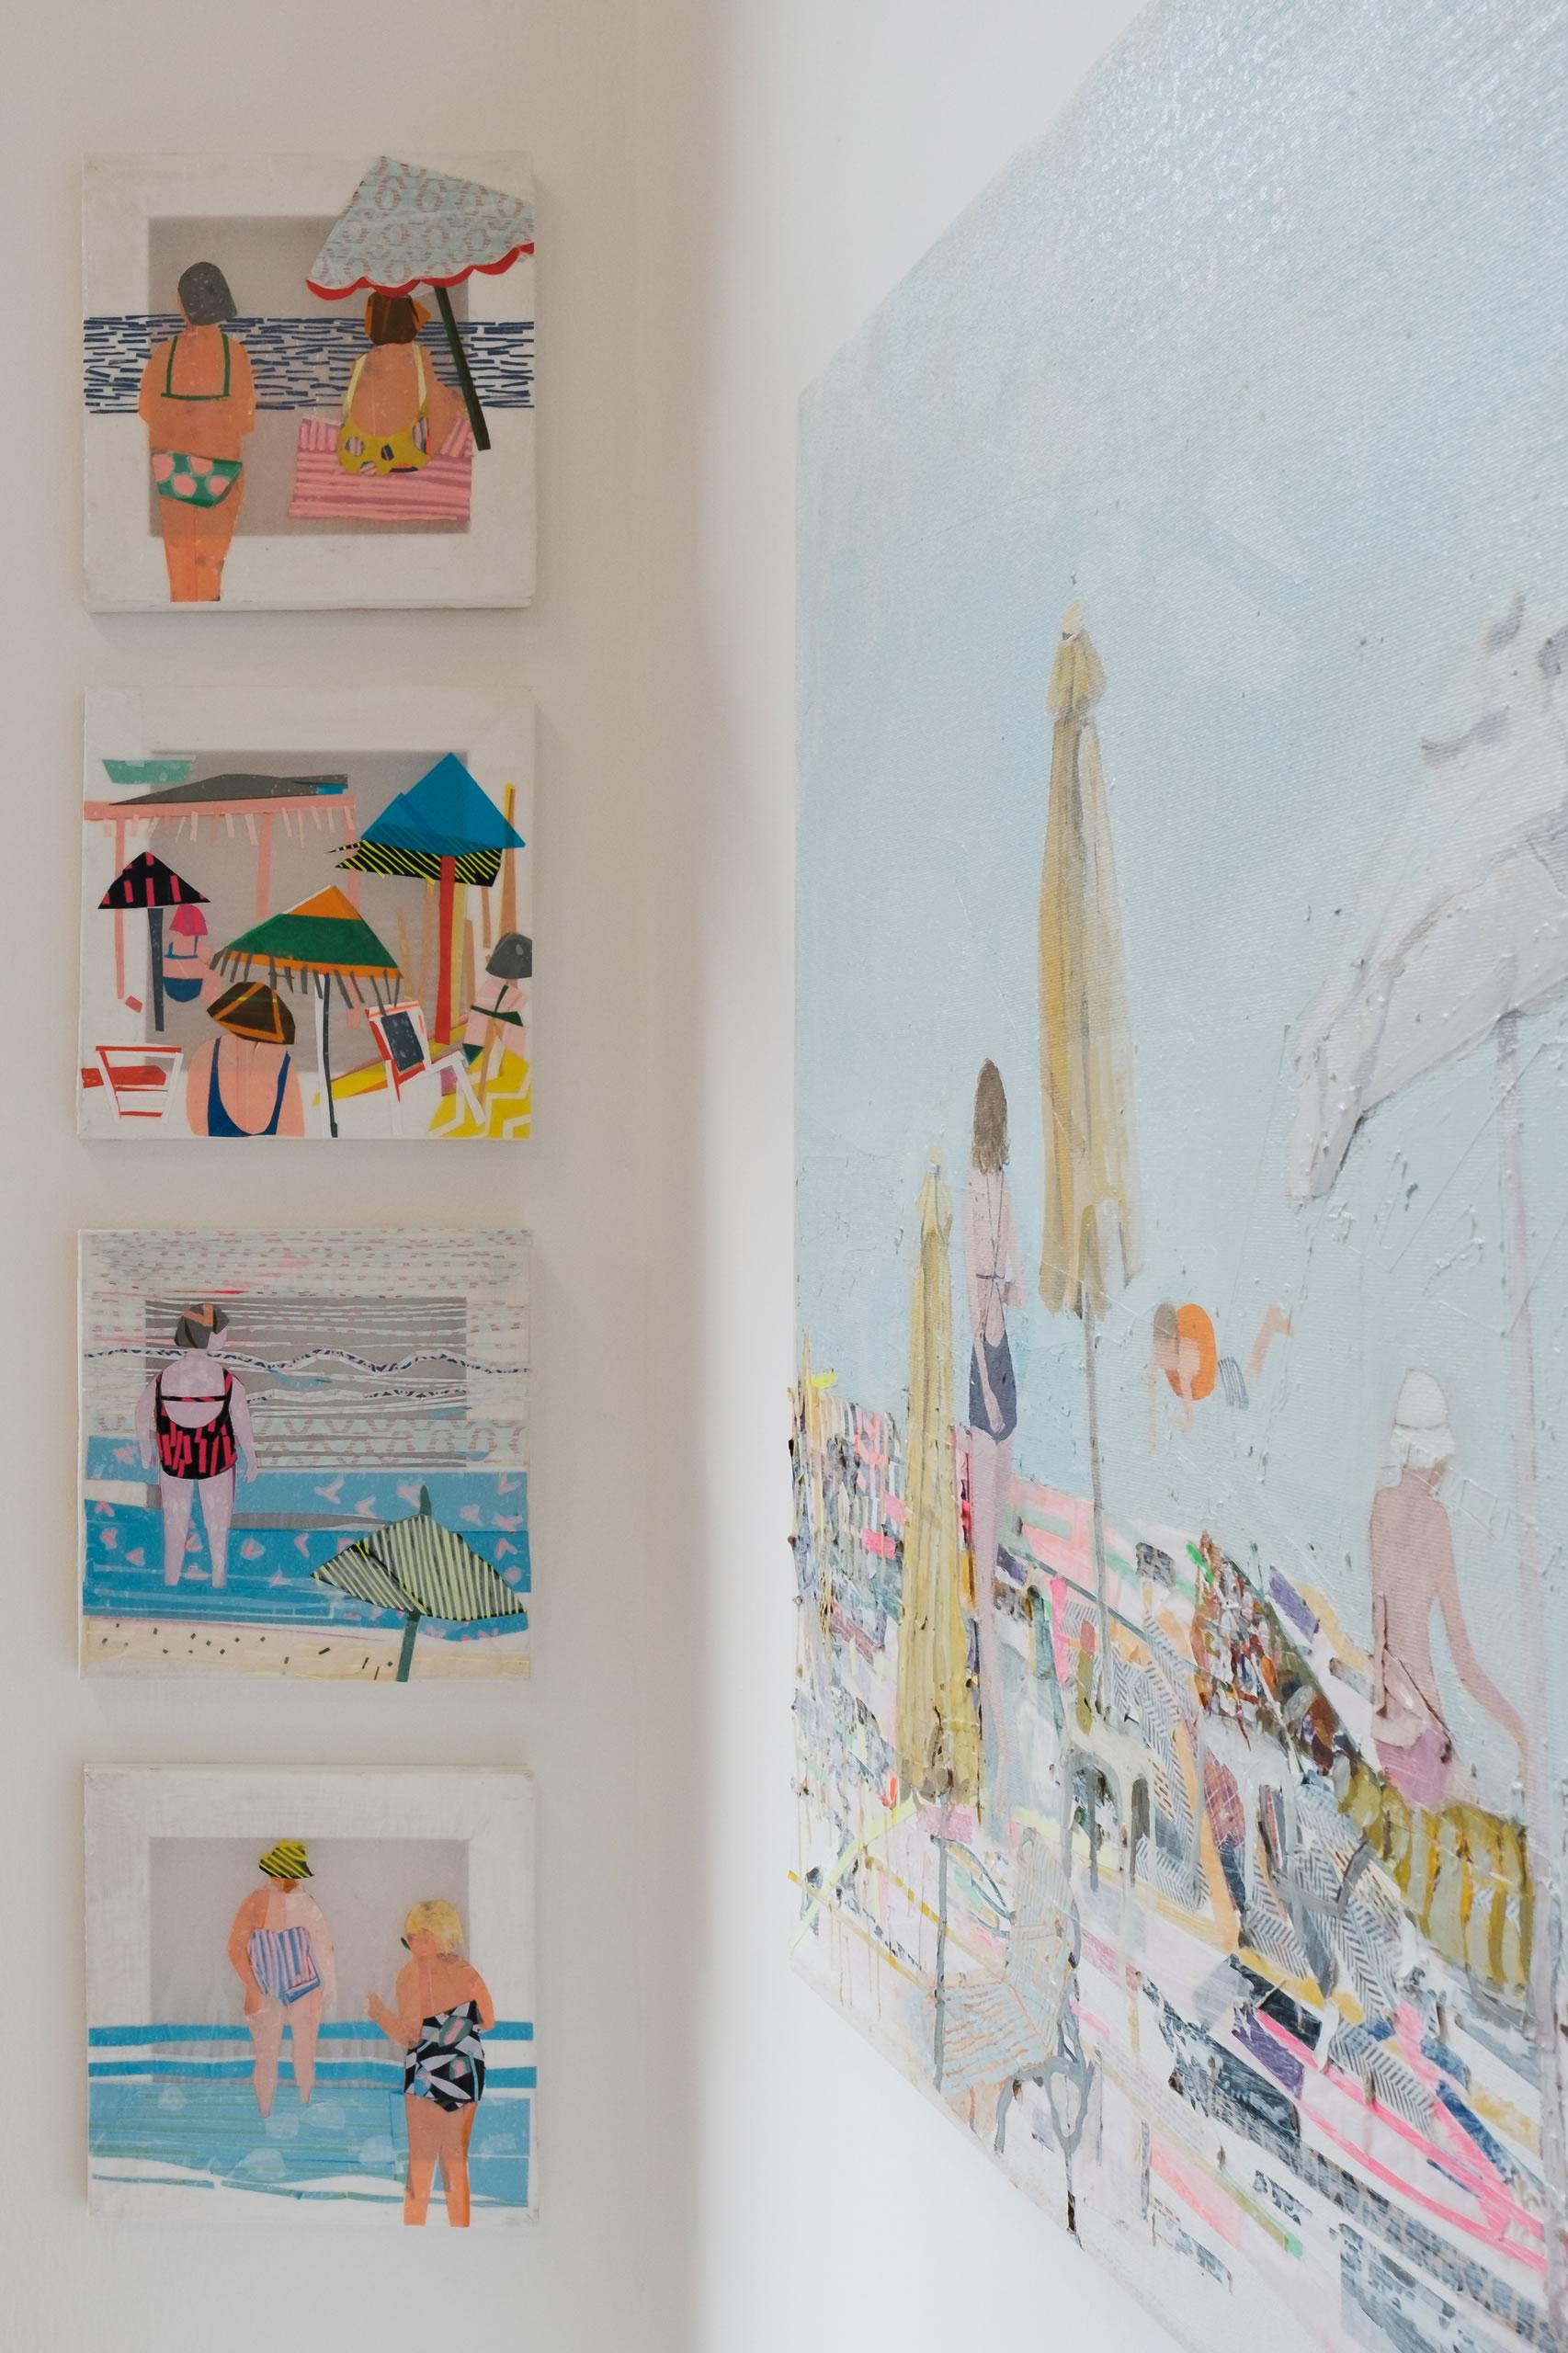 3. Törn | Anthia Loizou | Foto Manu Lasnik | 2019 | Galerie3